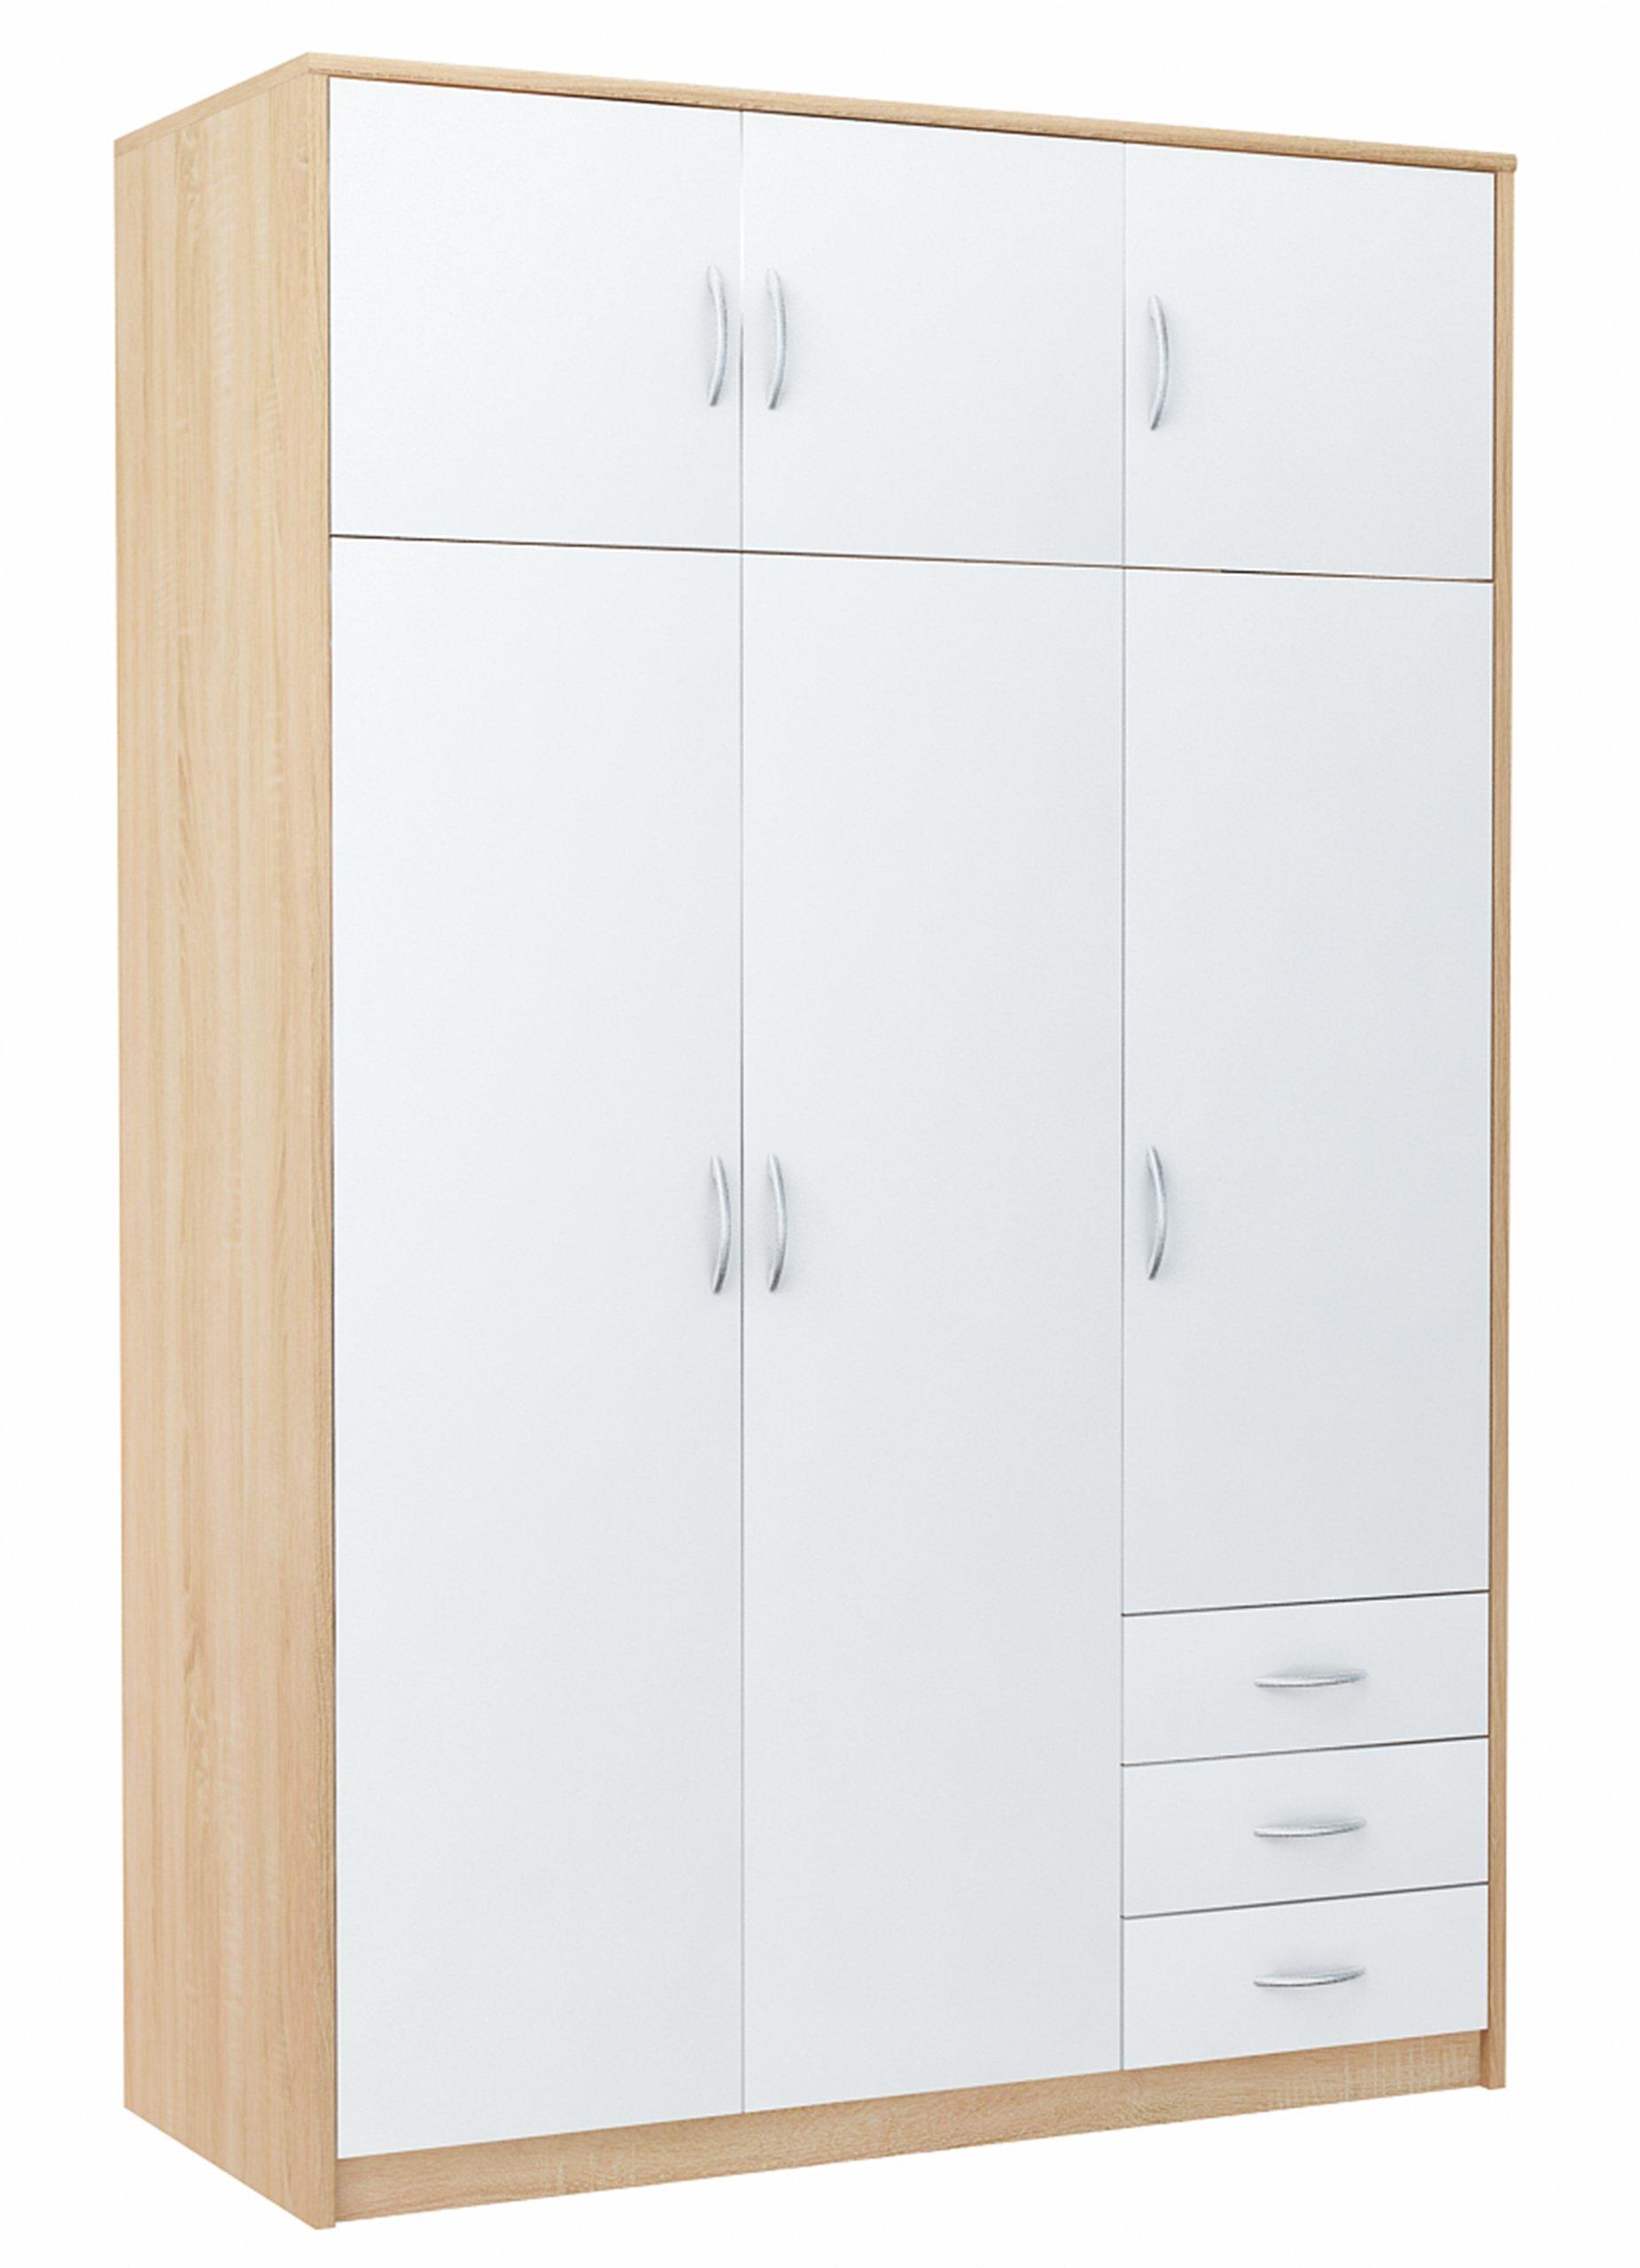 Шкаф платяной 6D3S WHITE-SONOMA комод, книжный шкаф, полка